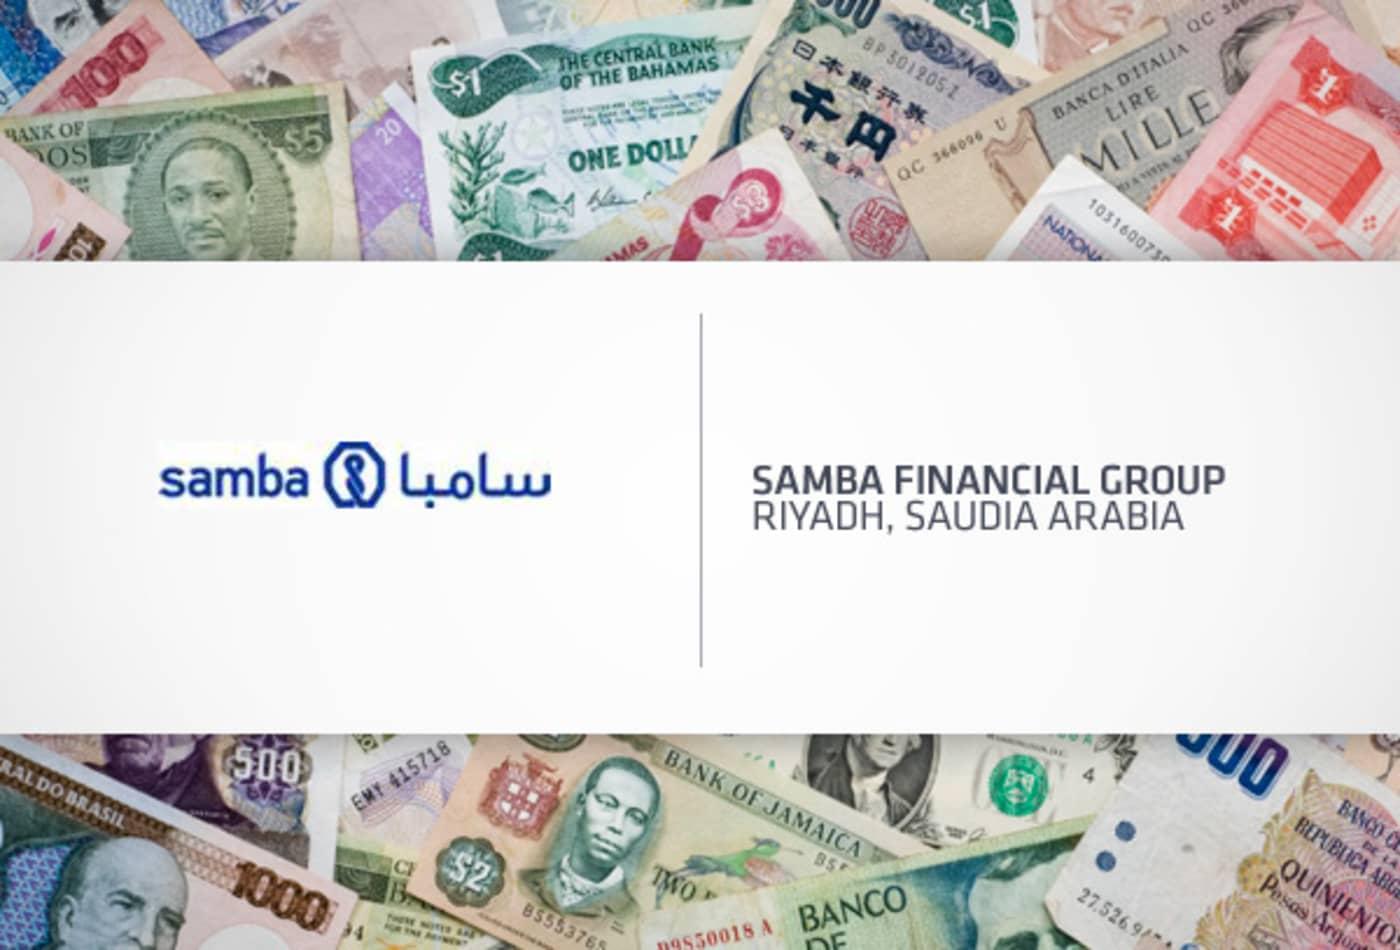 48679705 SS-Safest-Banks-samba-financial-group-saudia-arabia-12.jpg